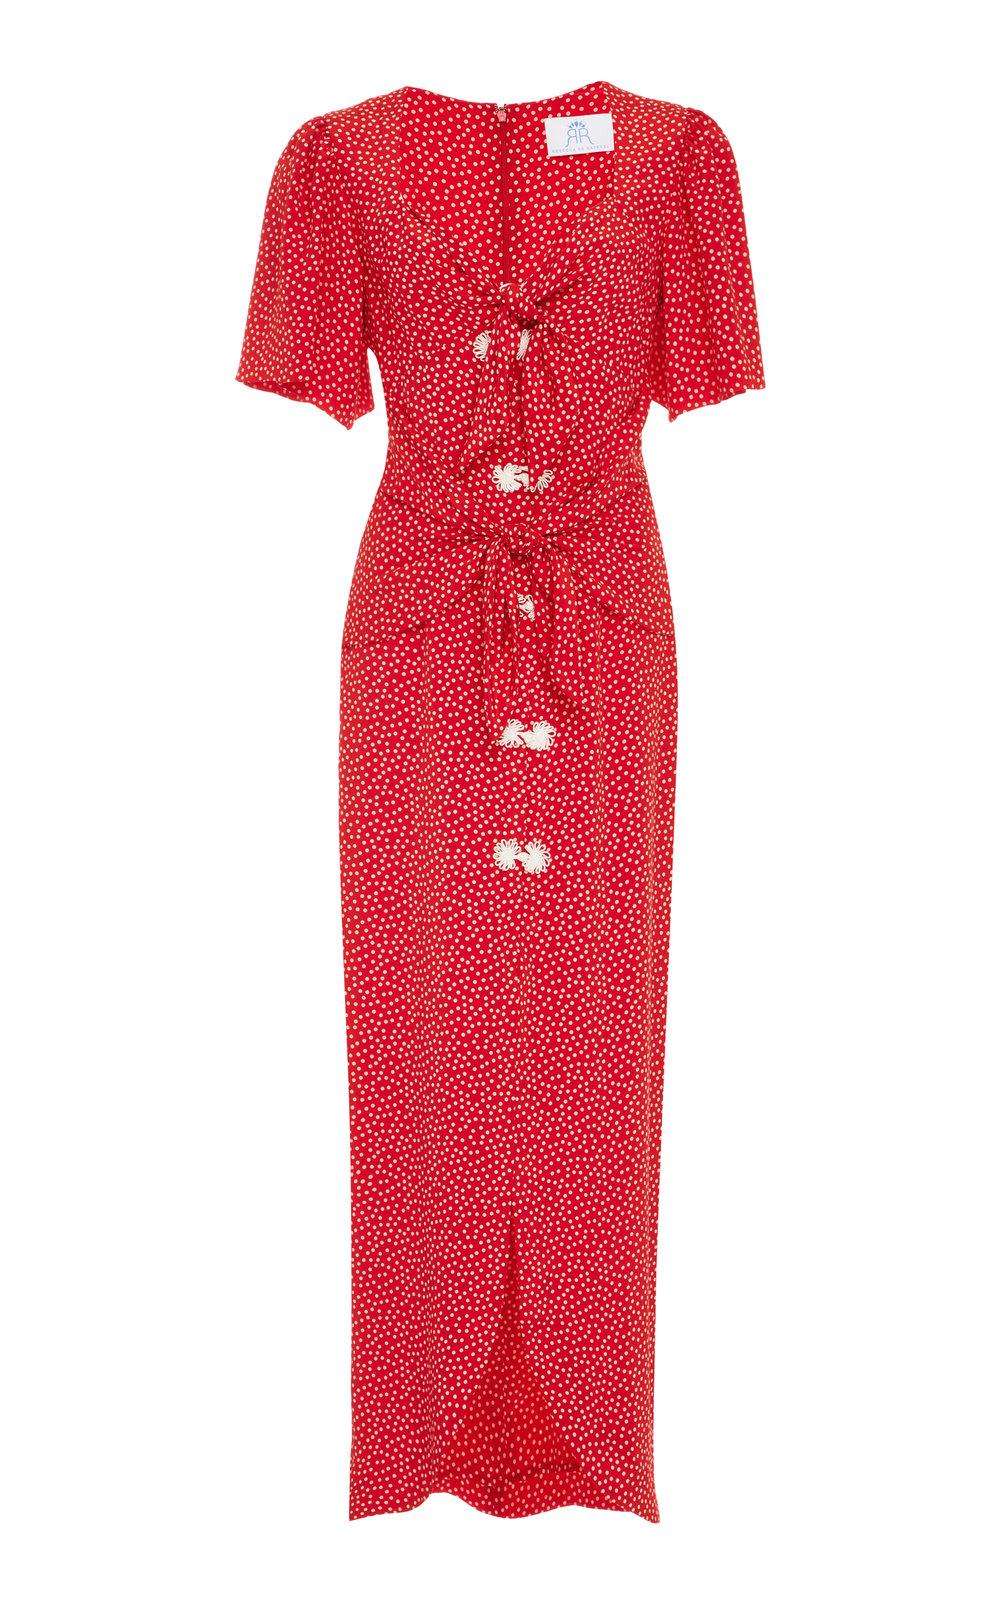 large_rebecca-de-ravenel-red-the-zaza-silk-midi-dress.jpg